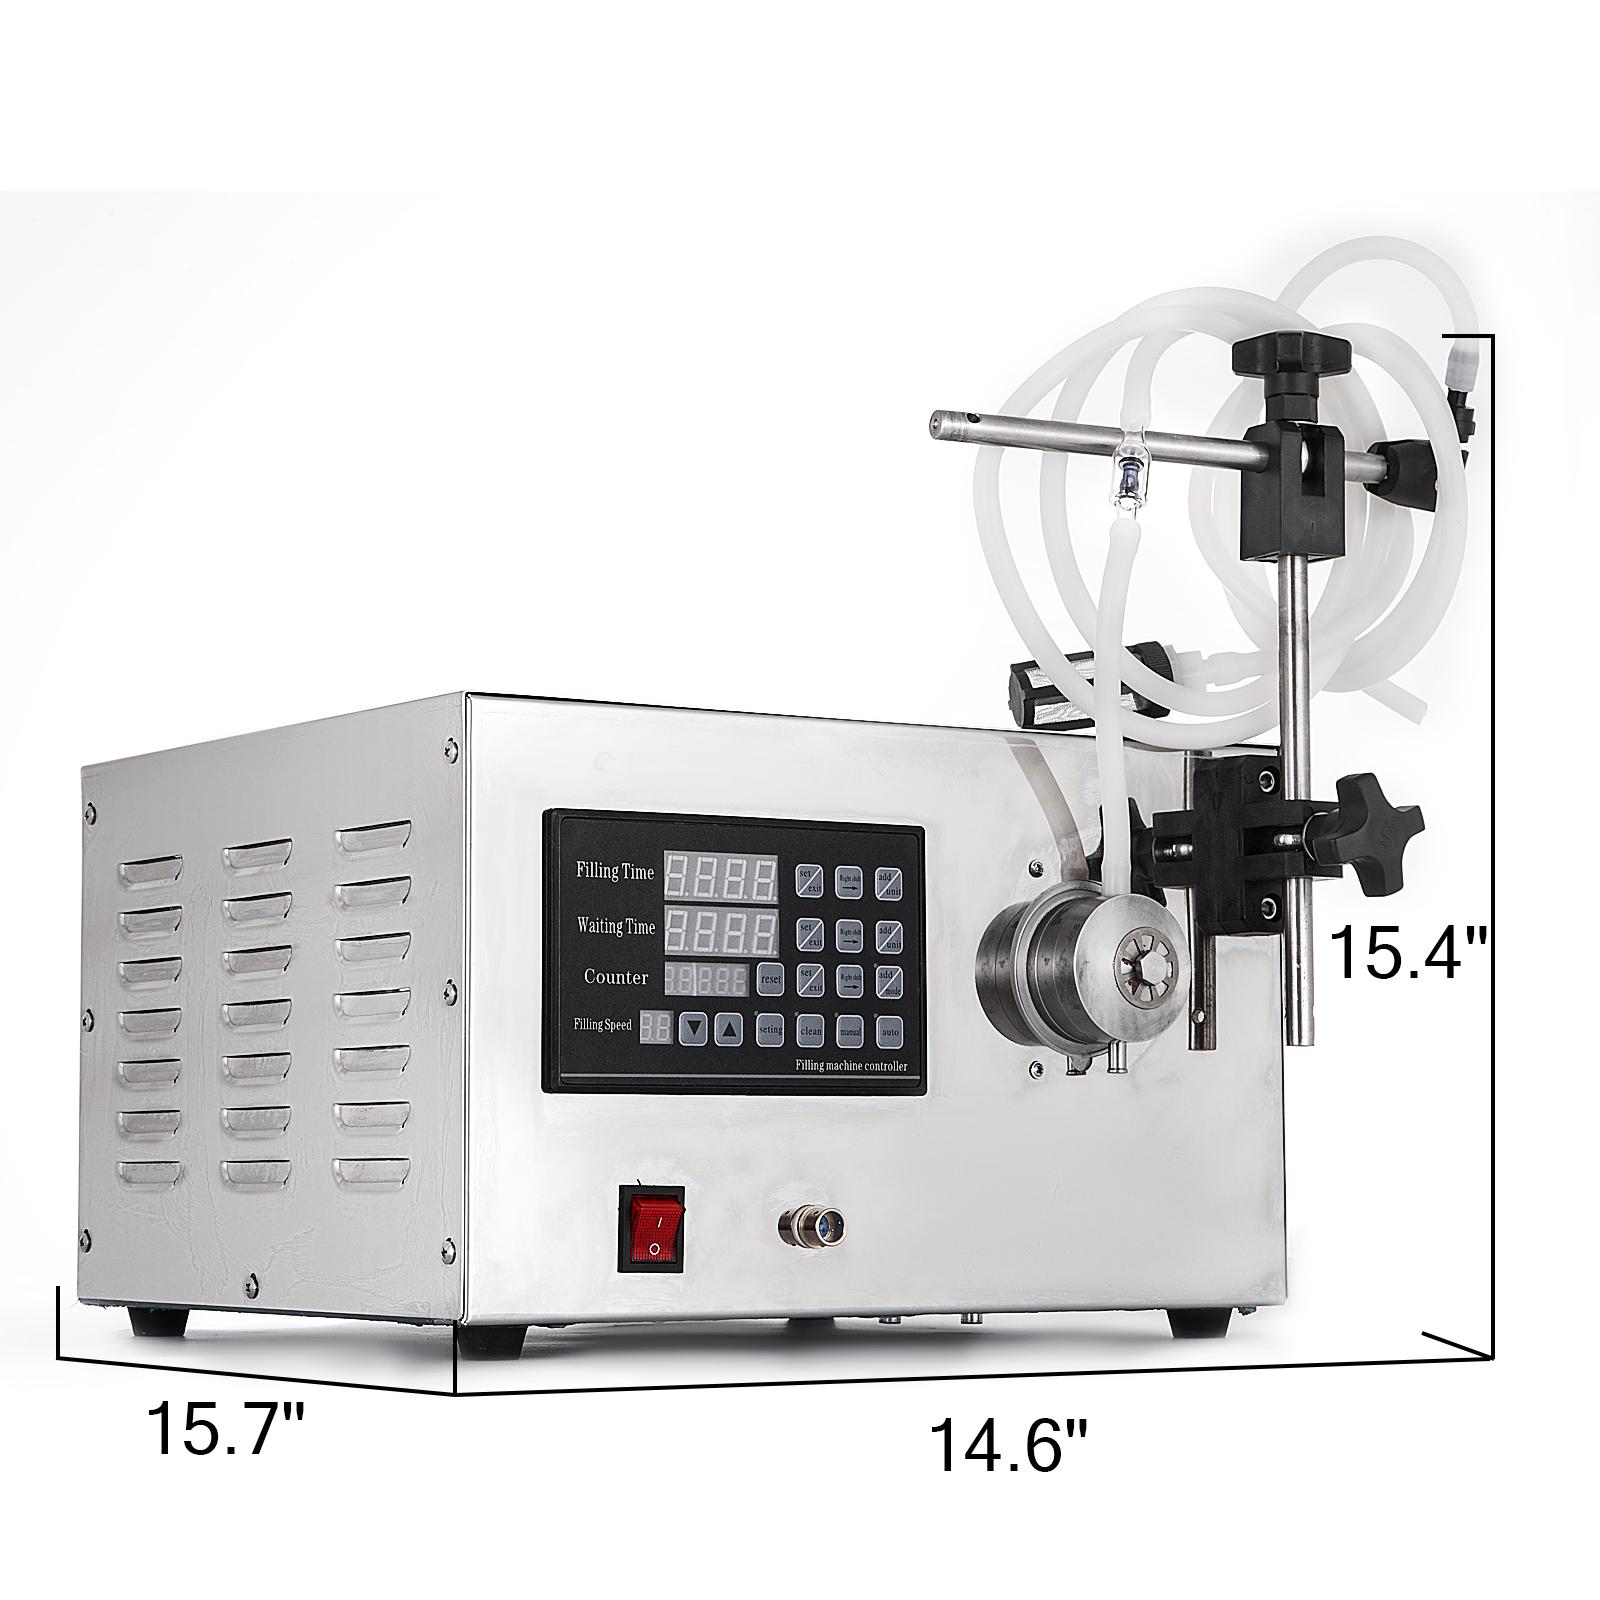 Liquid-Filling-Machine-Filler-Remplissage-2-3500ML-50-500ML-INDUSTRY-SUPPLY miniature 98